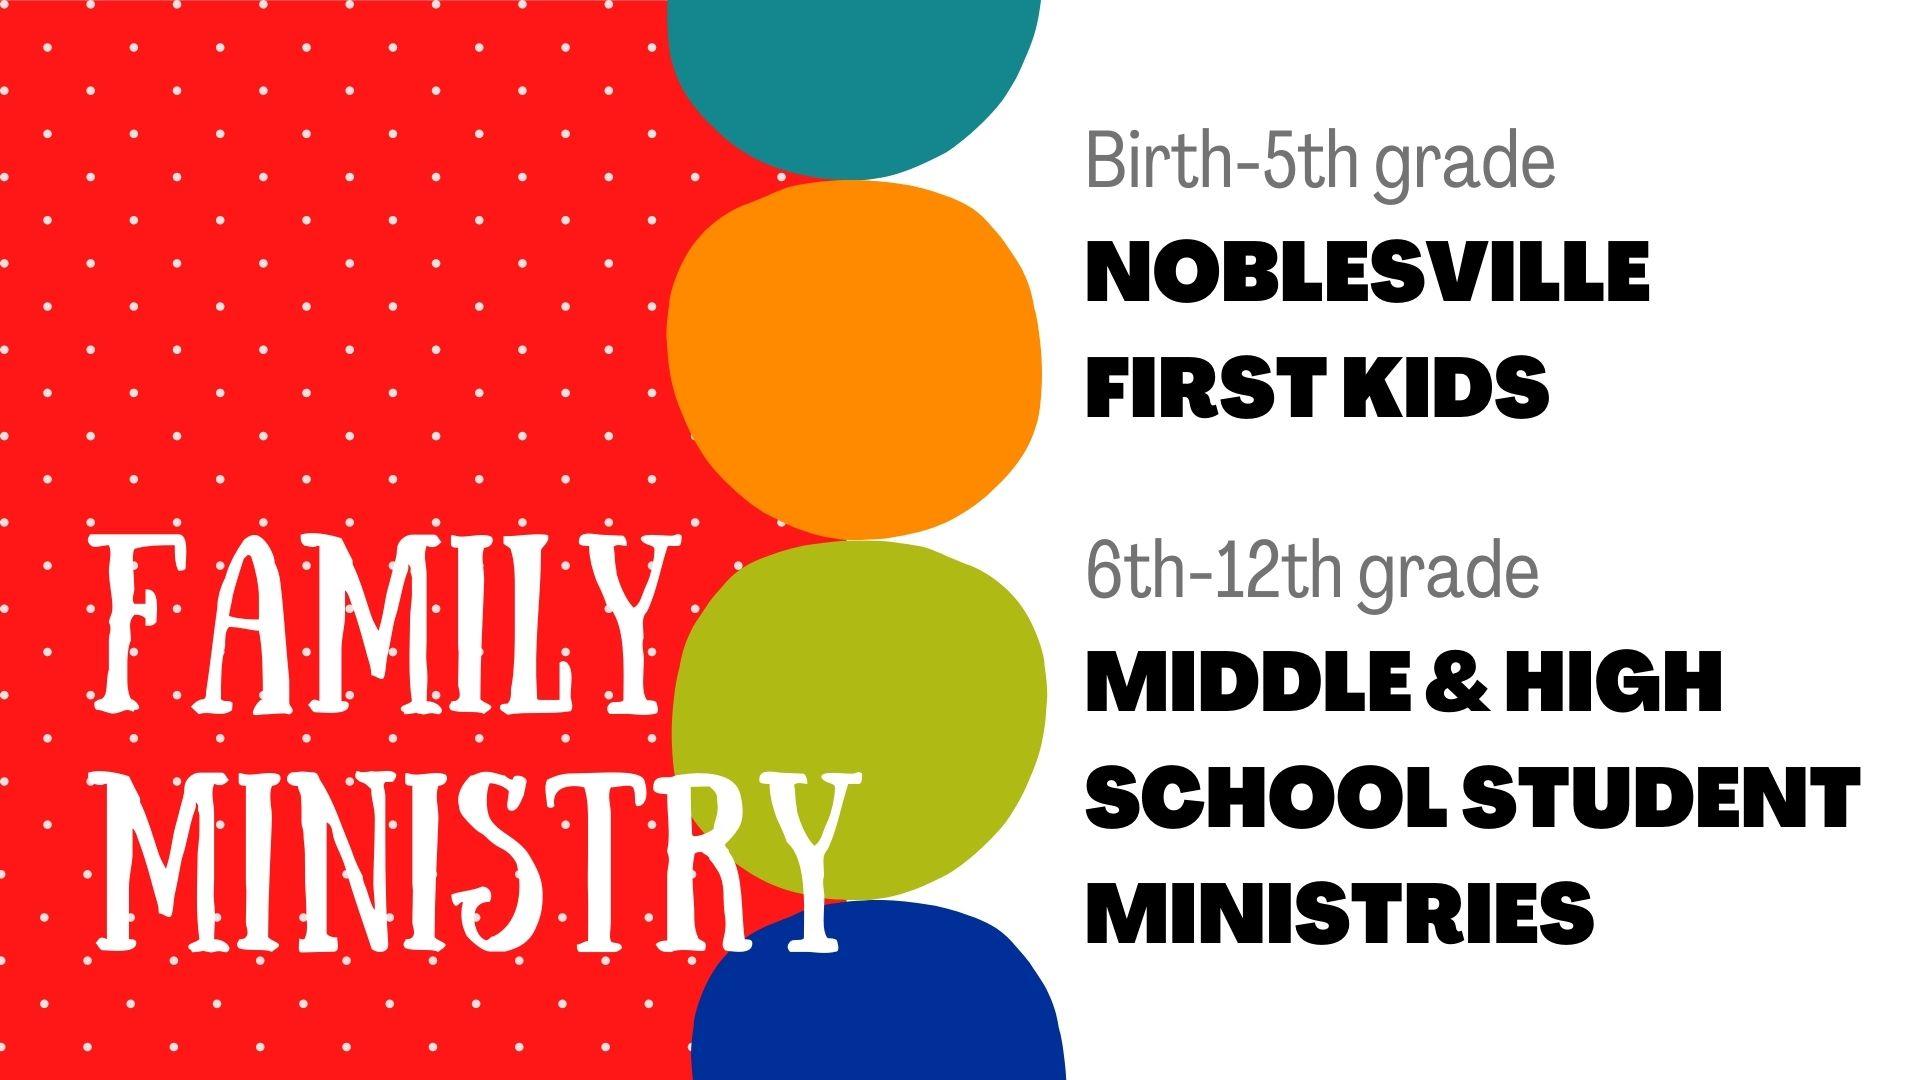 Family Ministry slide 05-27a